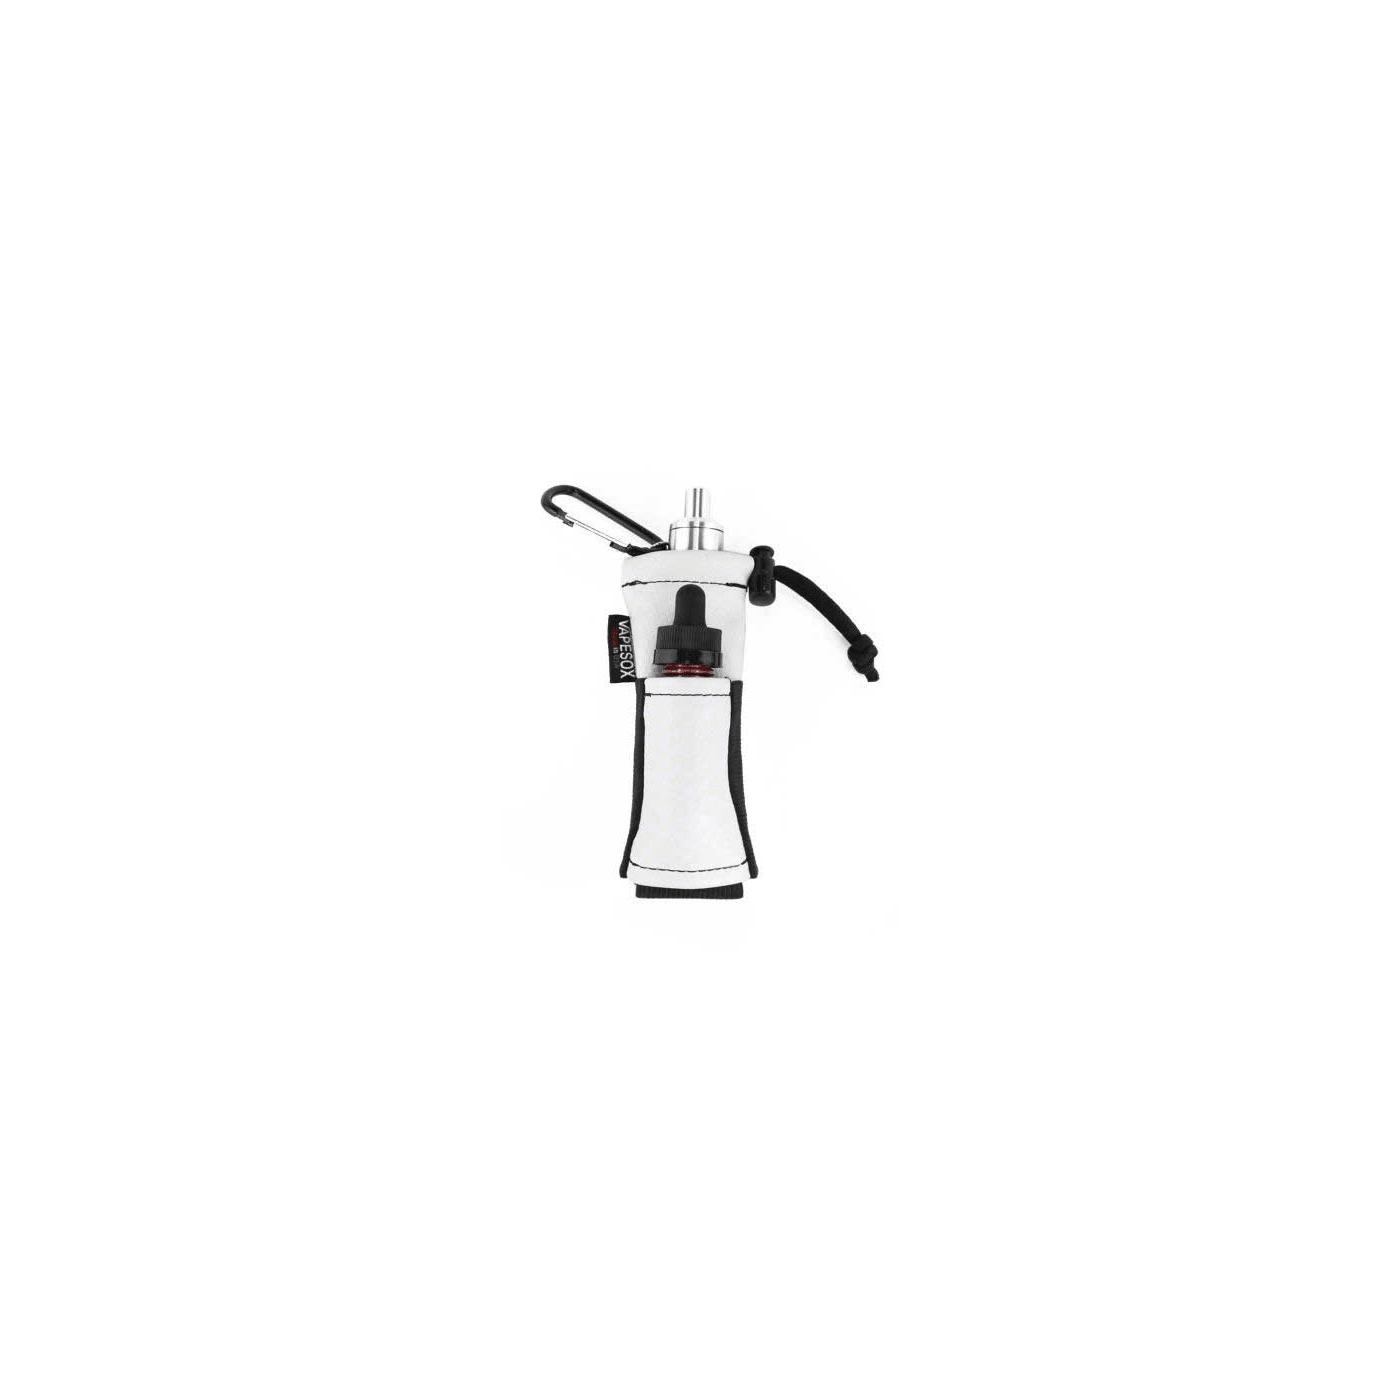 Vapesox VS5 Mod Holder - White Carbon Fiber with Items